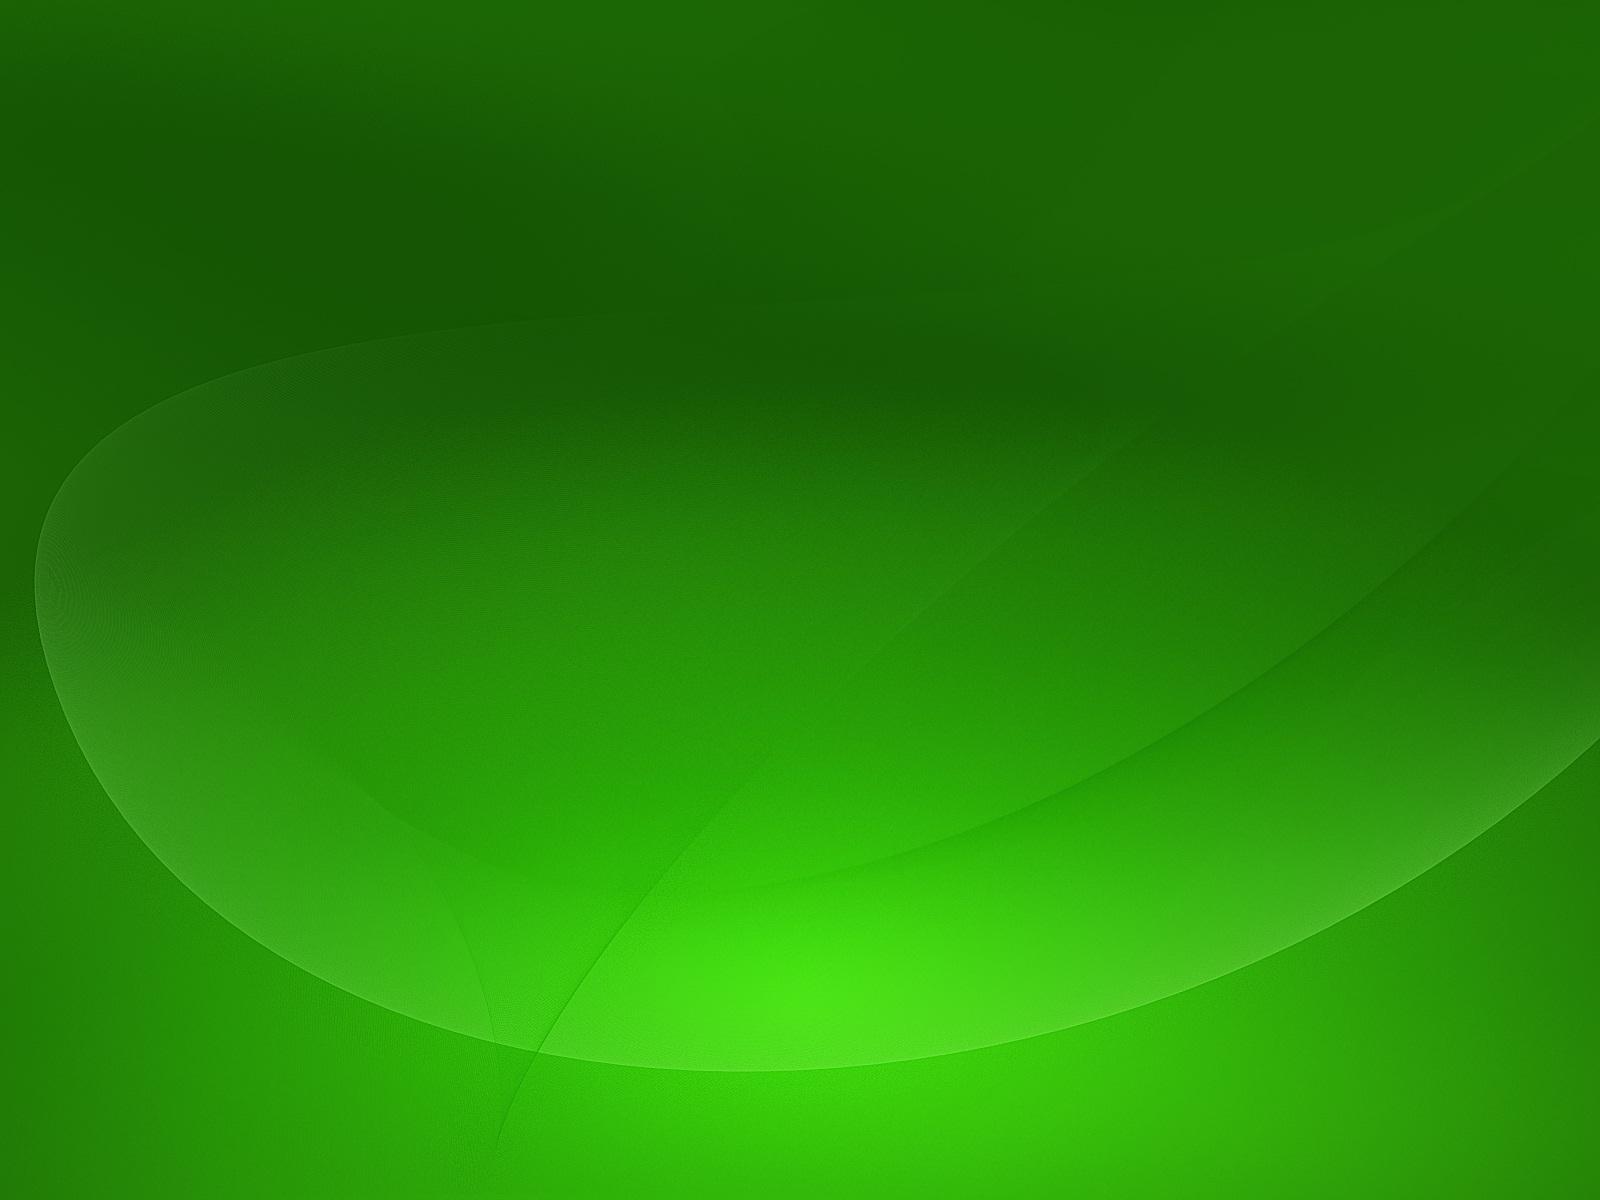 Abstract Desktop Backgrounds HD Wallpapers Art Images green 1600x1200